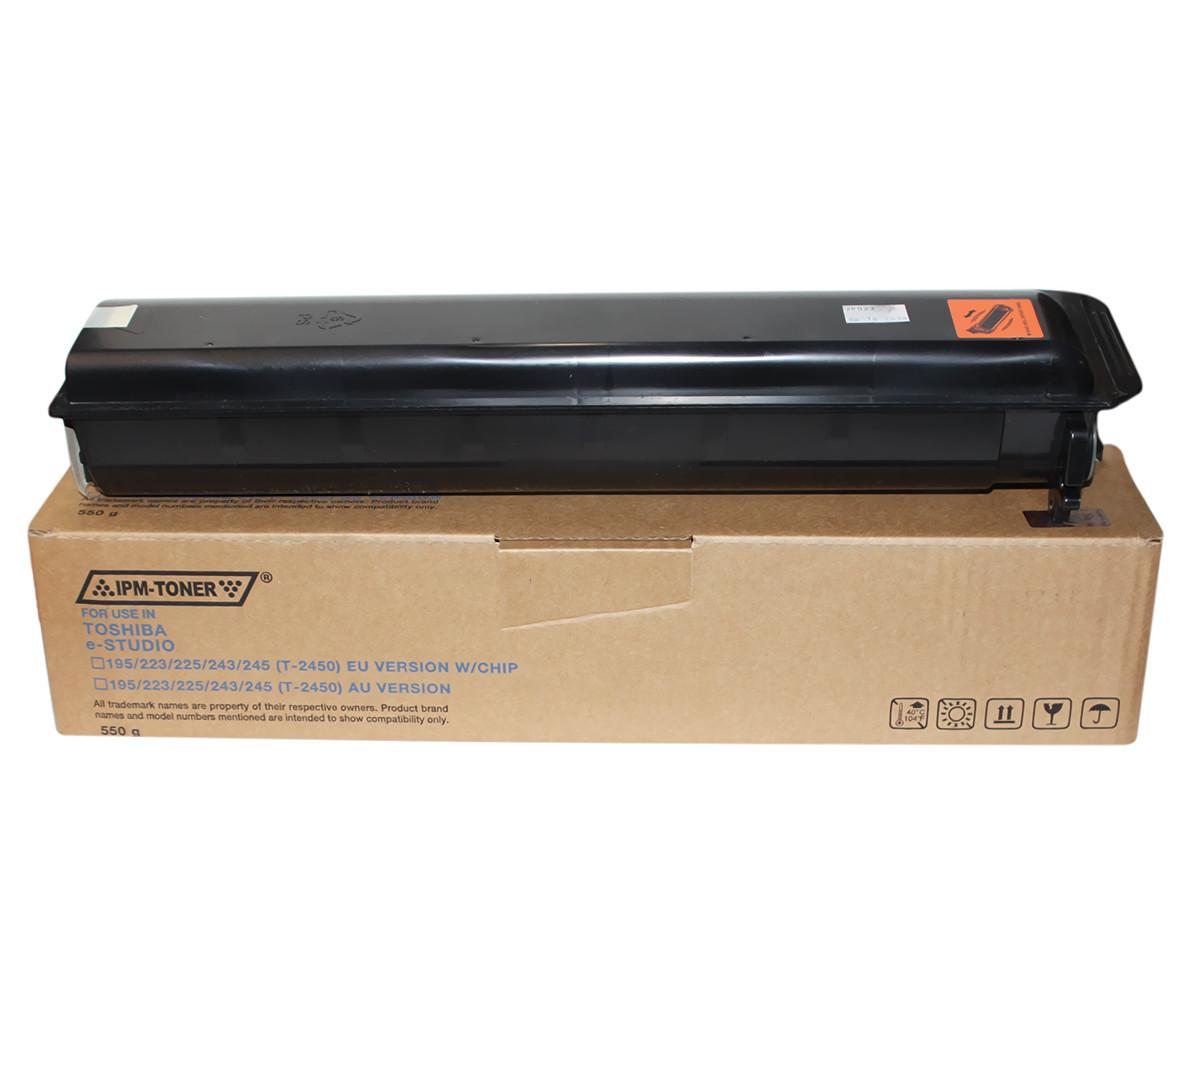 Тонер Toshiba T-2450, Black, e-Studio 195/223/225/243/245, туба, 550 г, IPM (TKT24EU)